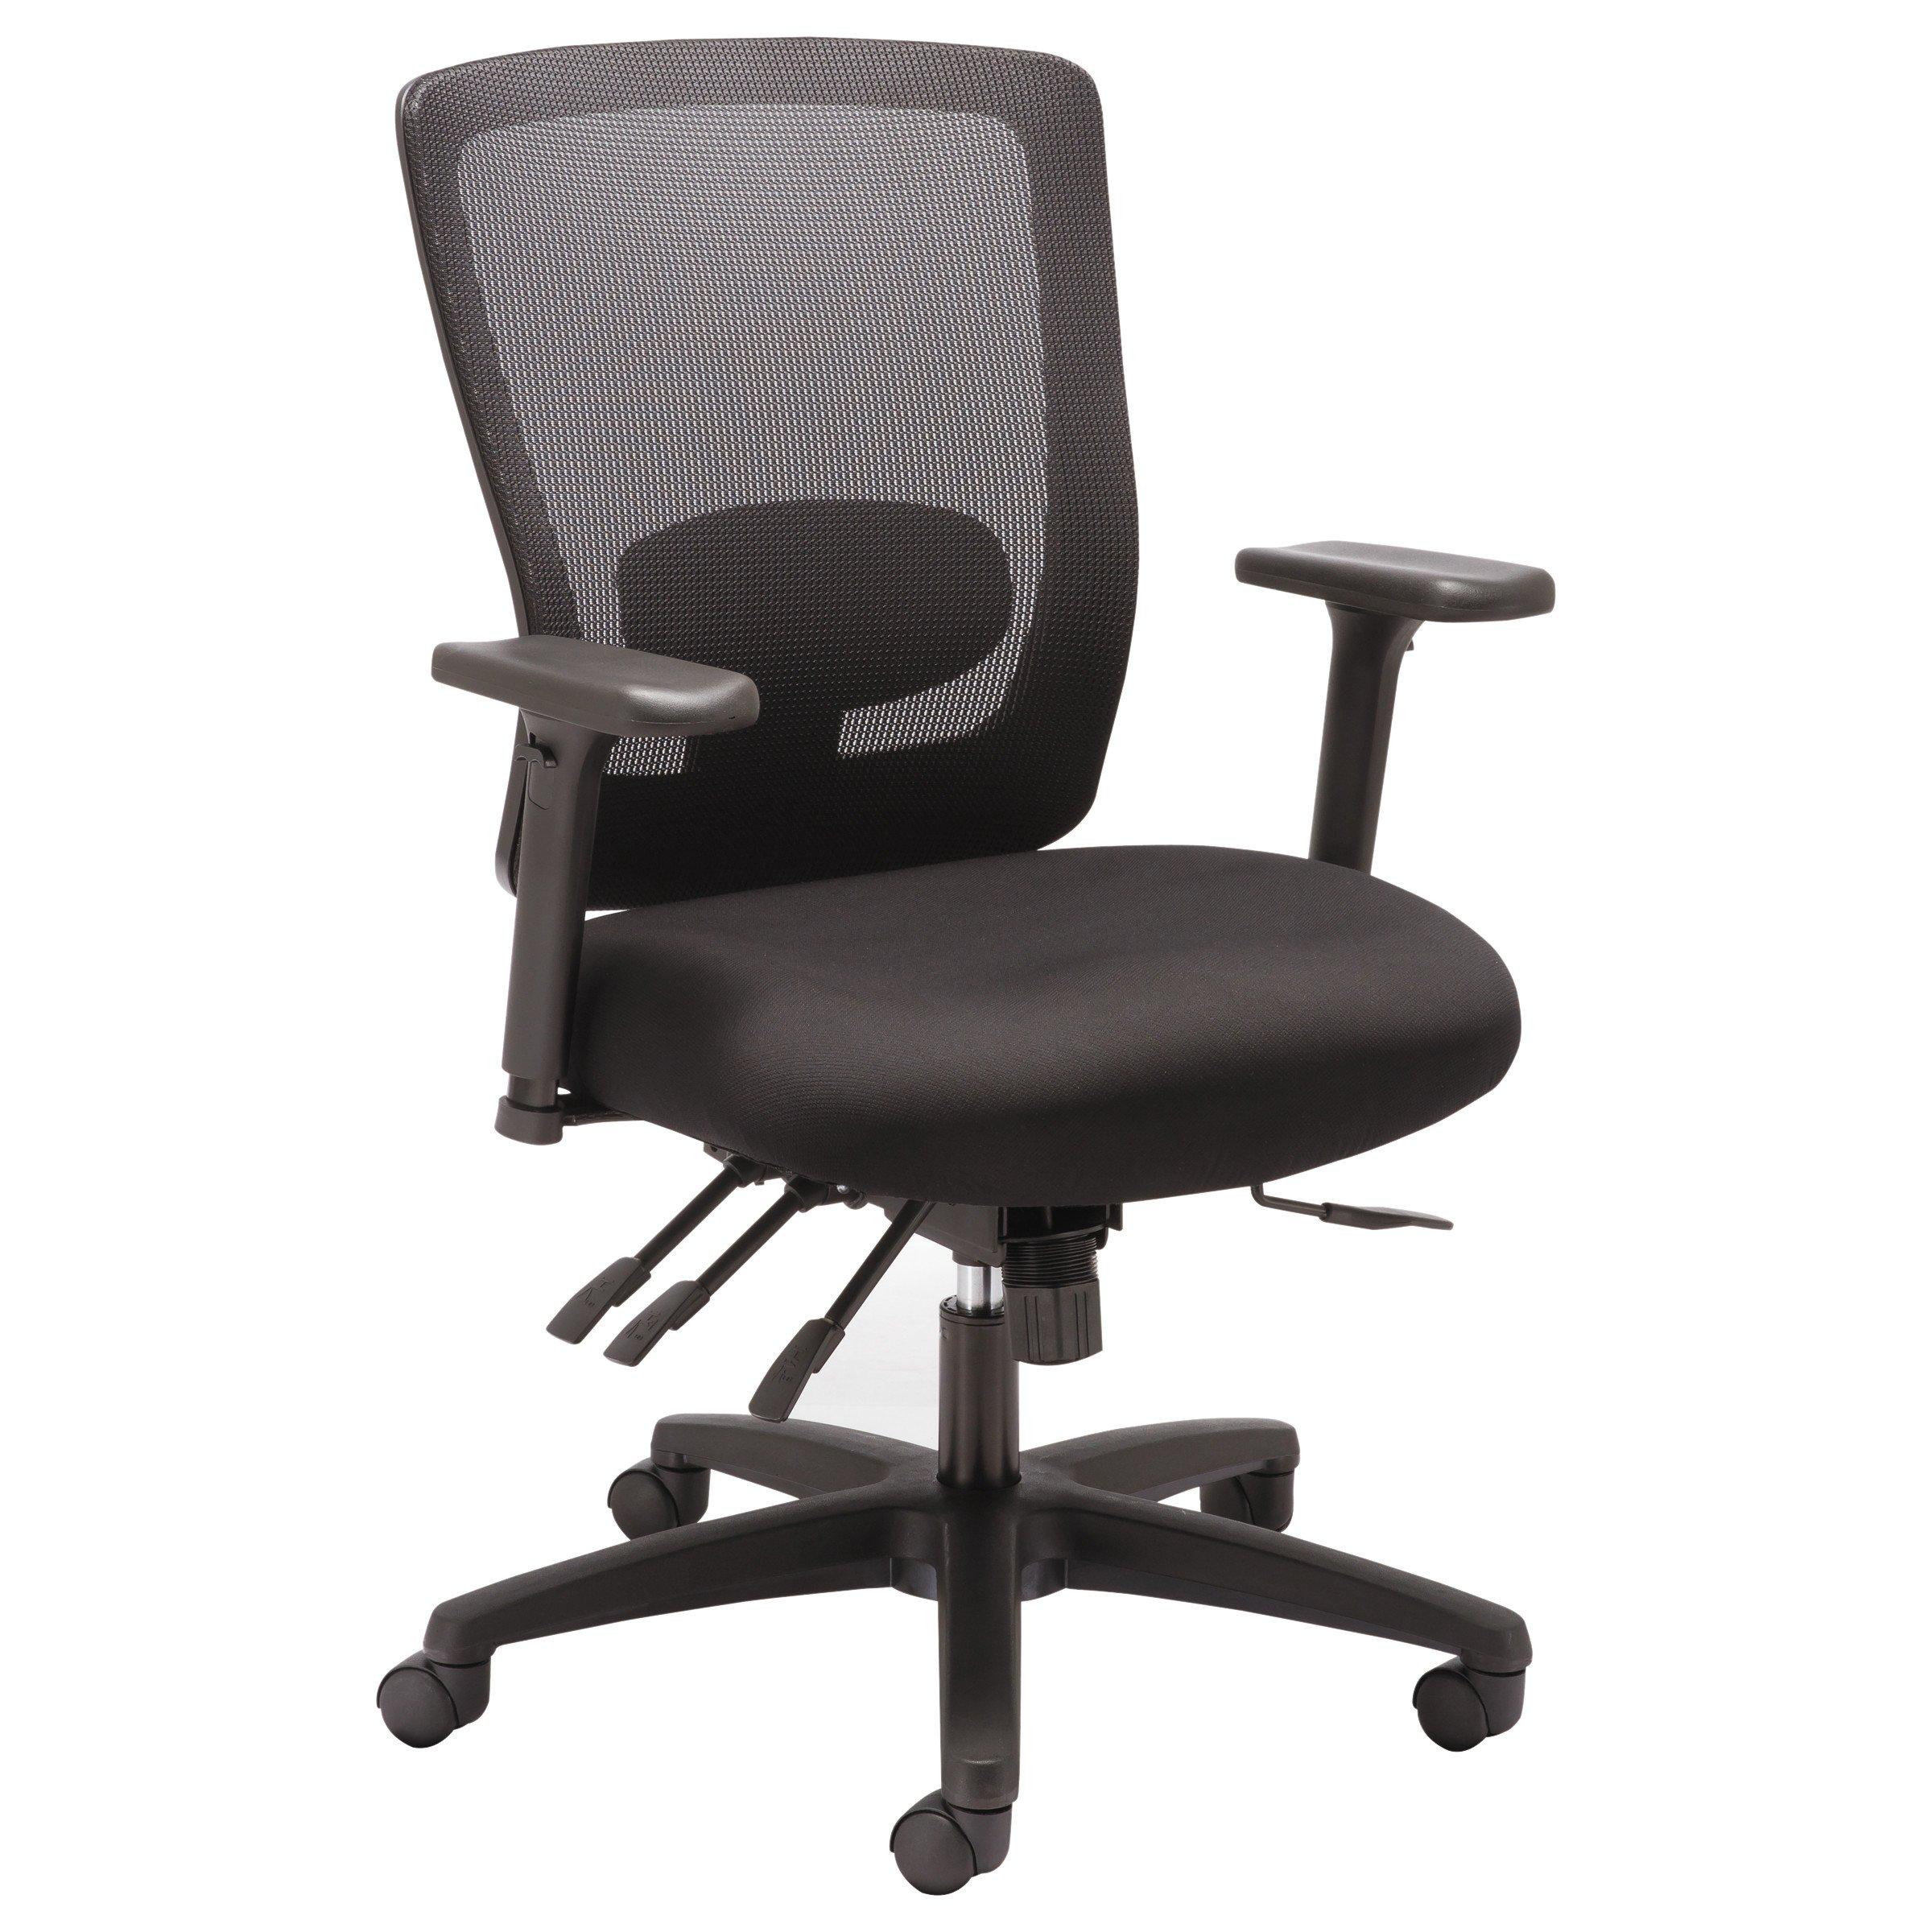 Alera ALENV42M14 Mid Back Multifunction Chair